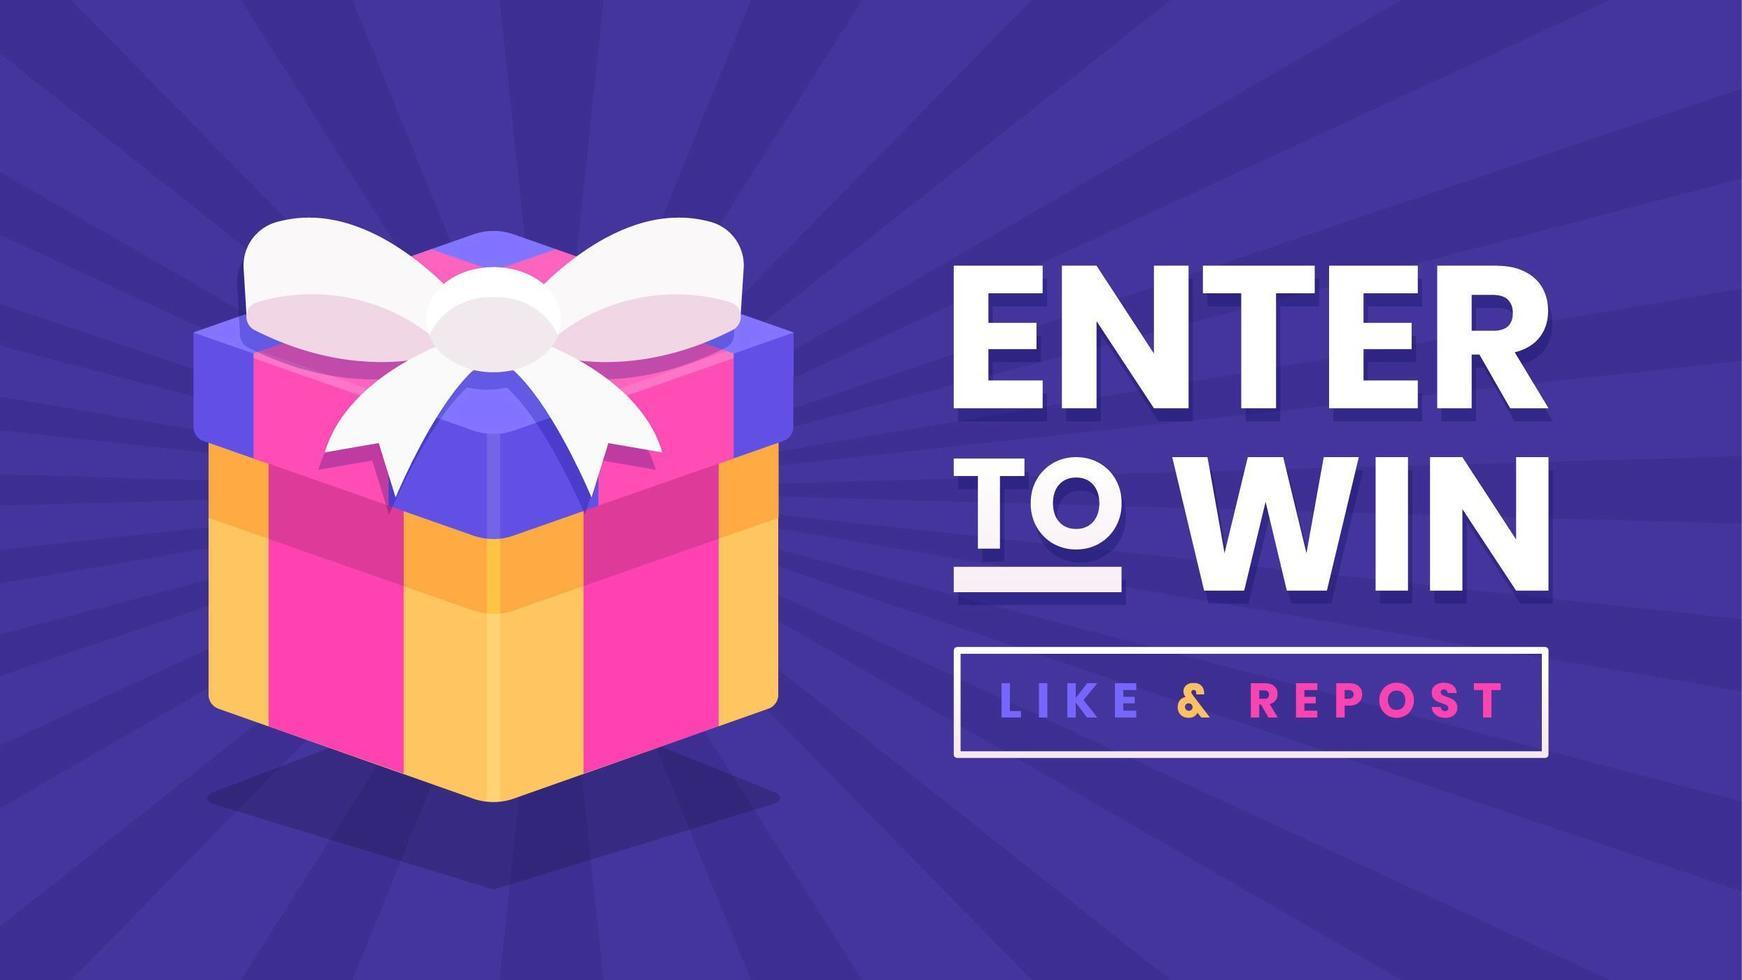 Enter To Win Gift Box Banner Vector